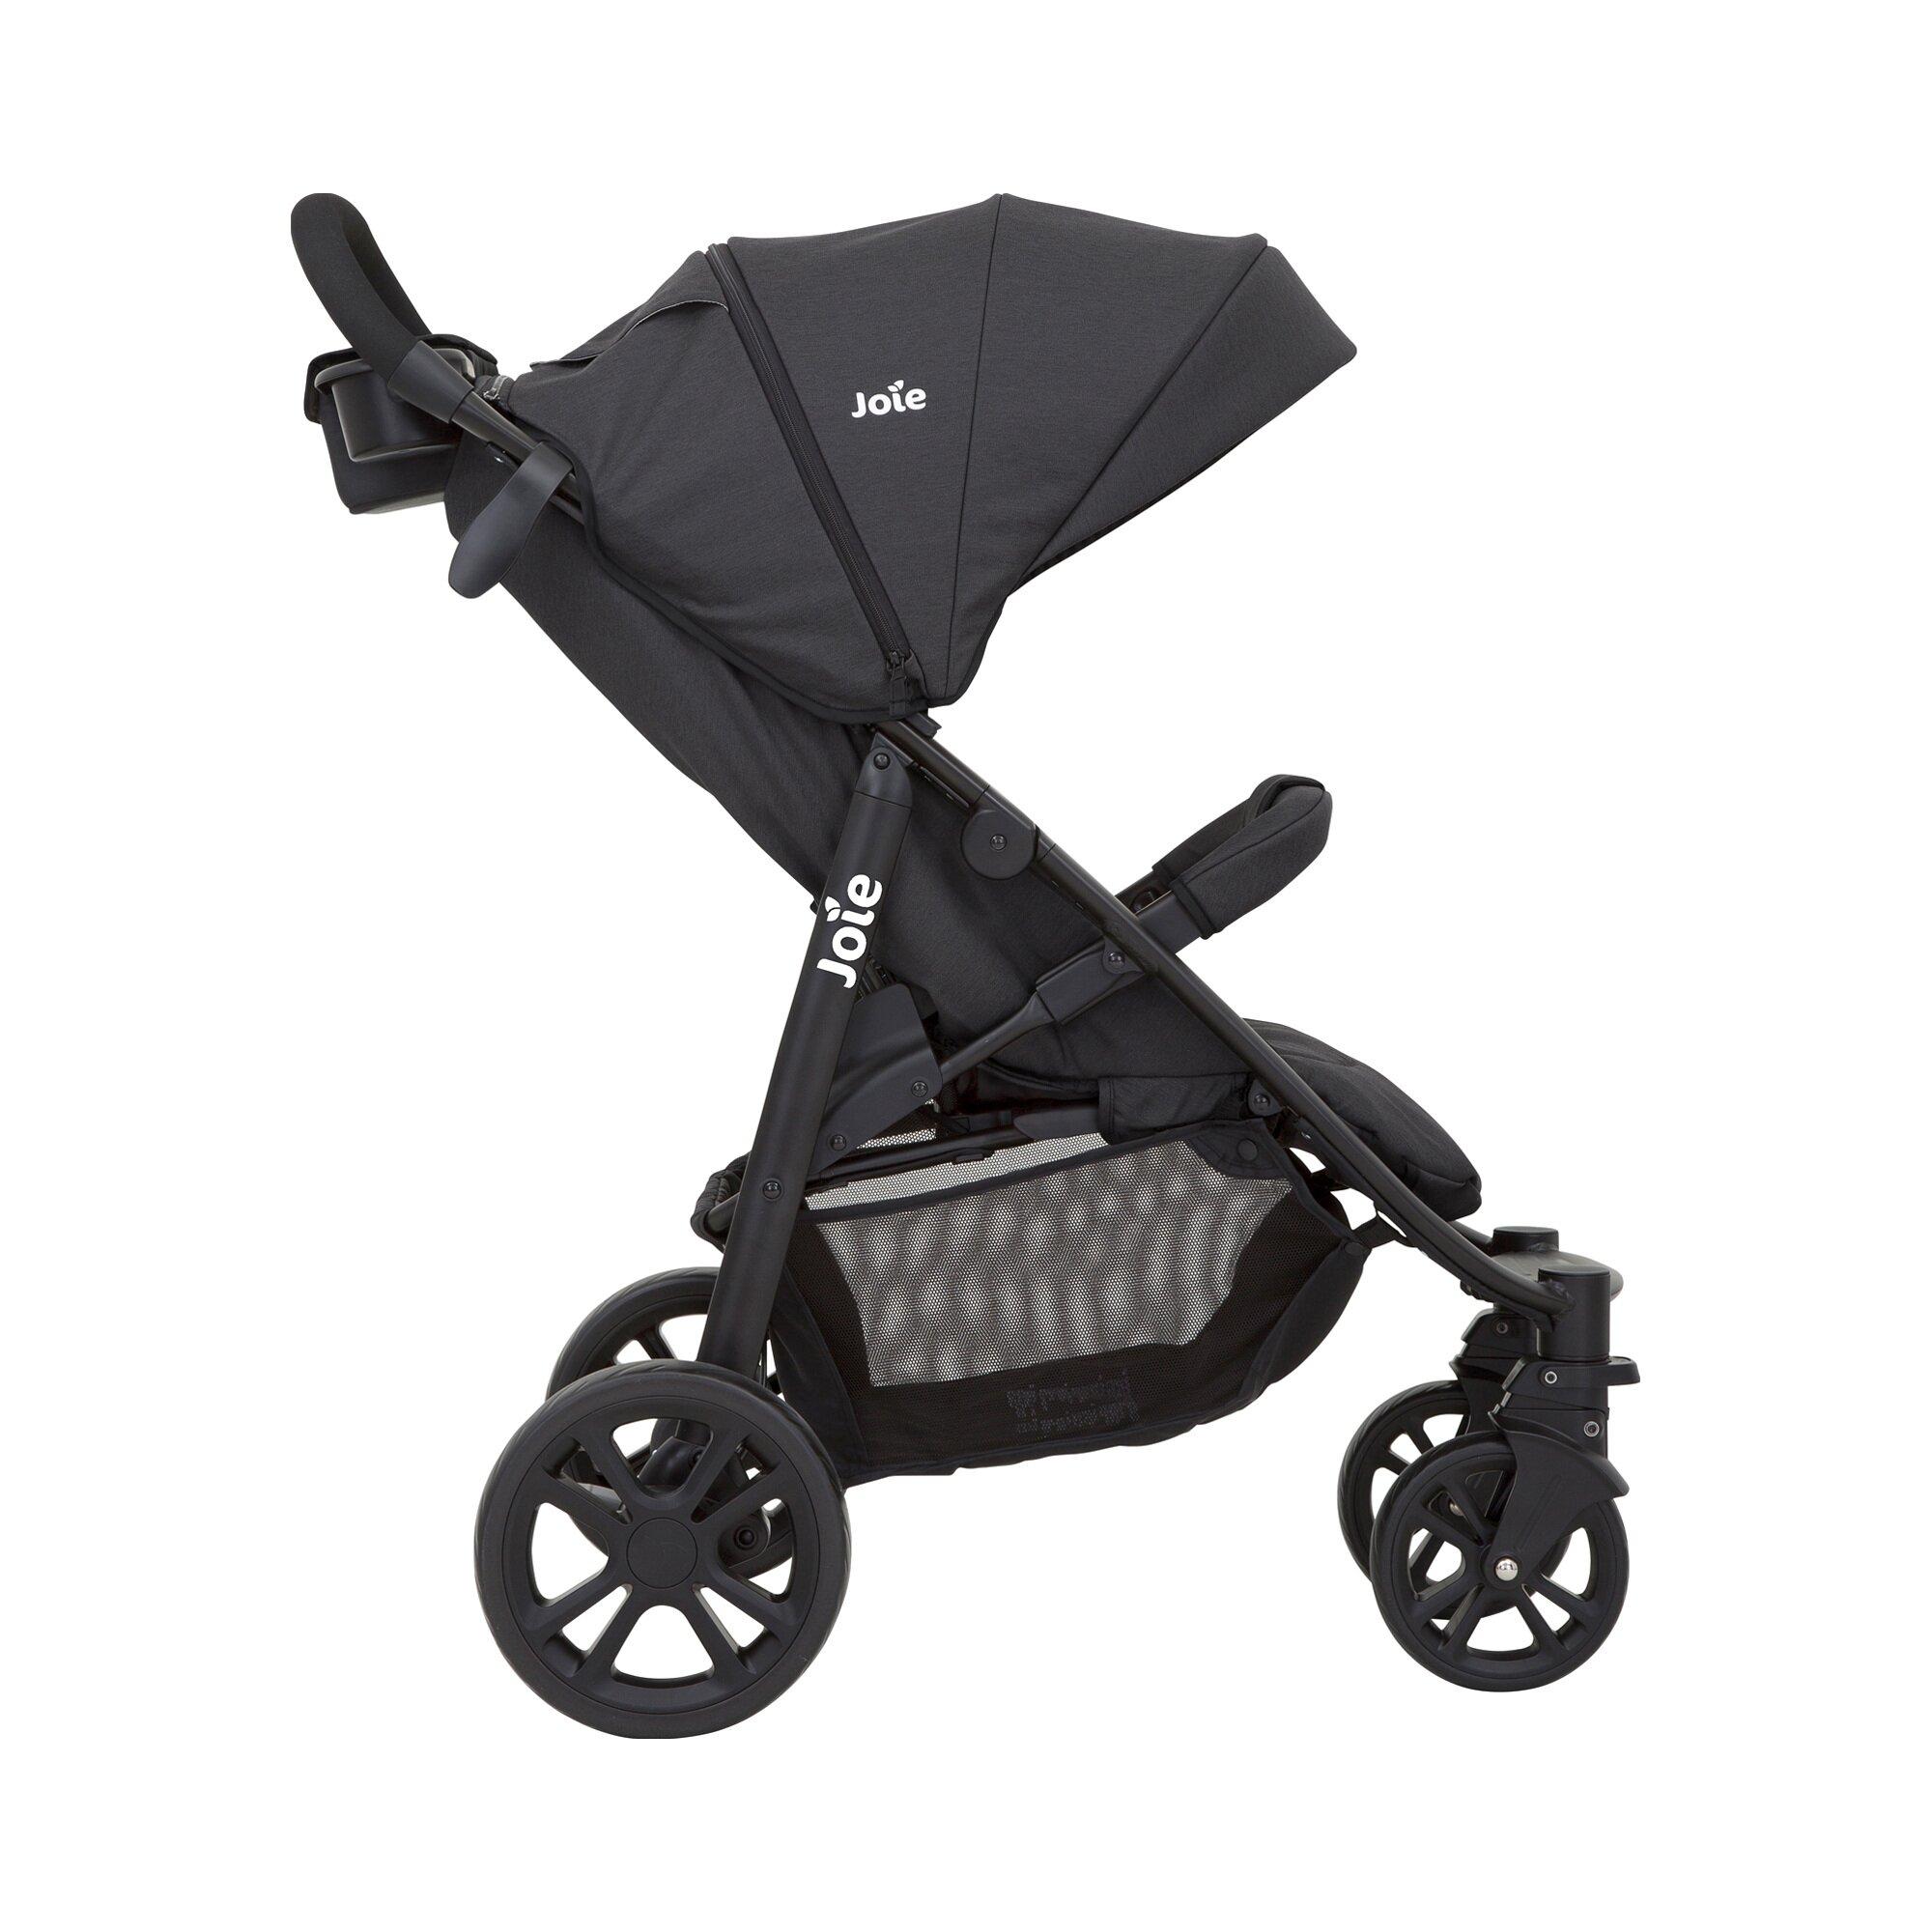 joie-litetrax-4-kinderwagen-sportwagen-schwarz